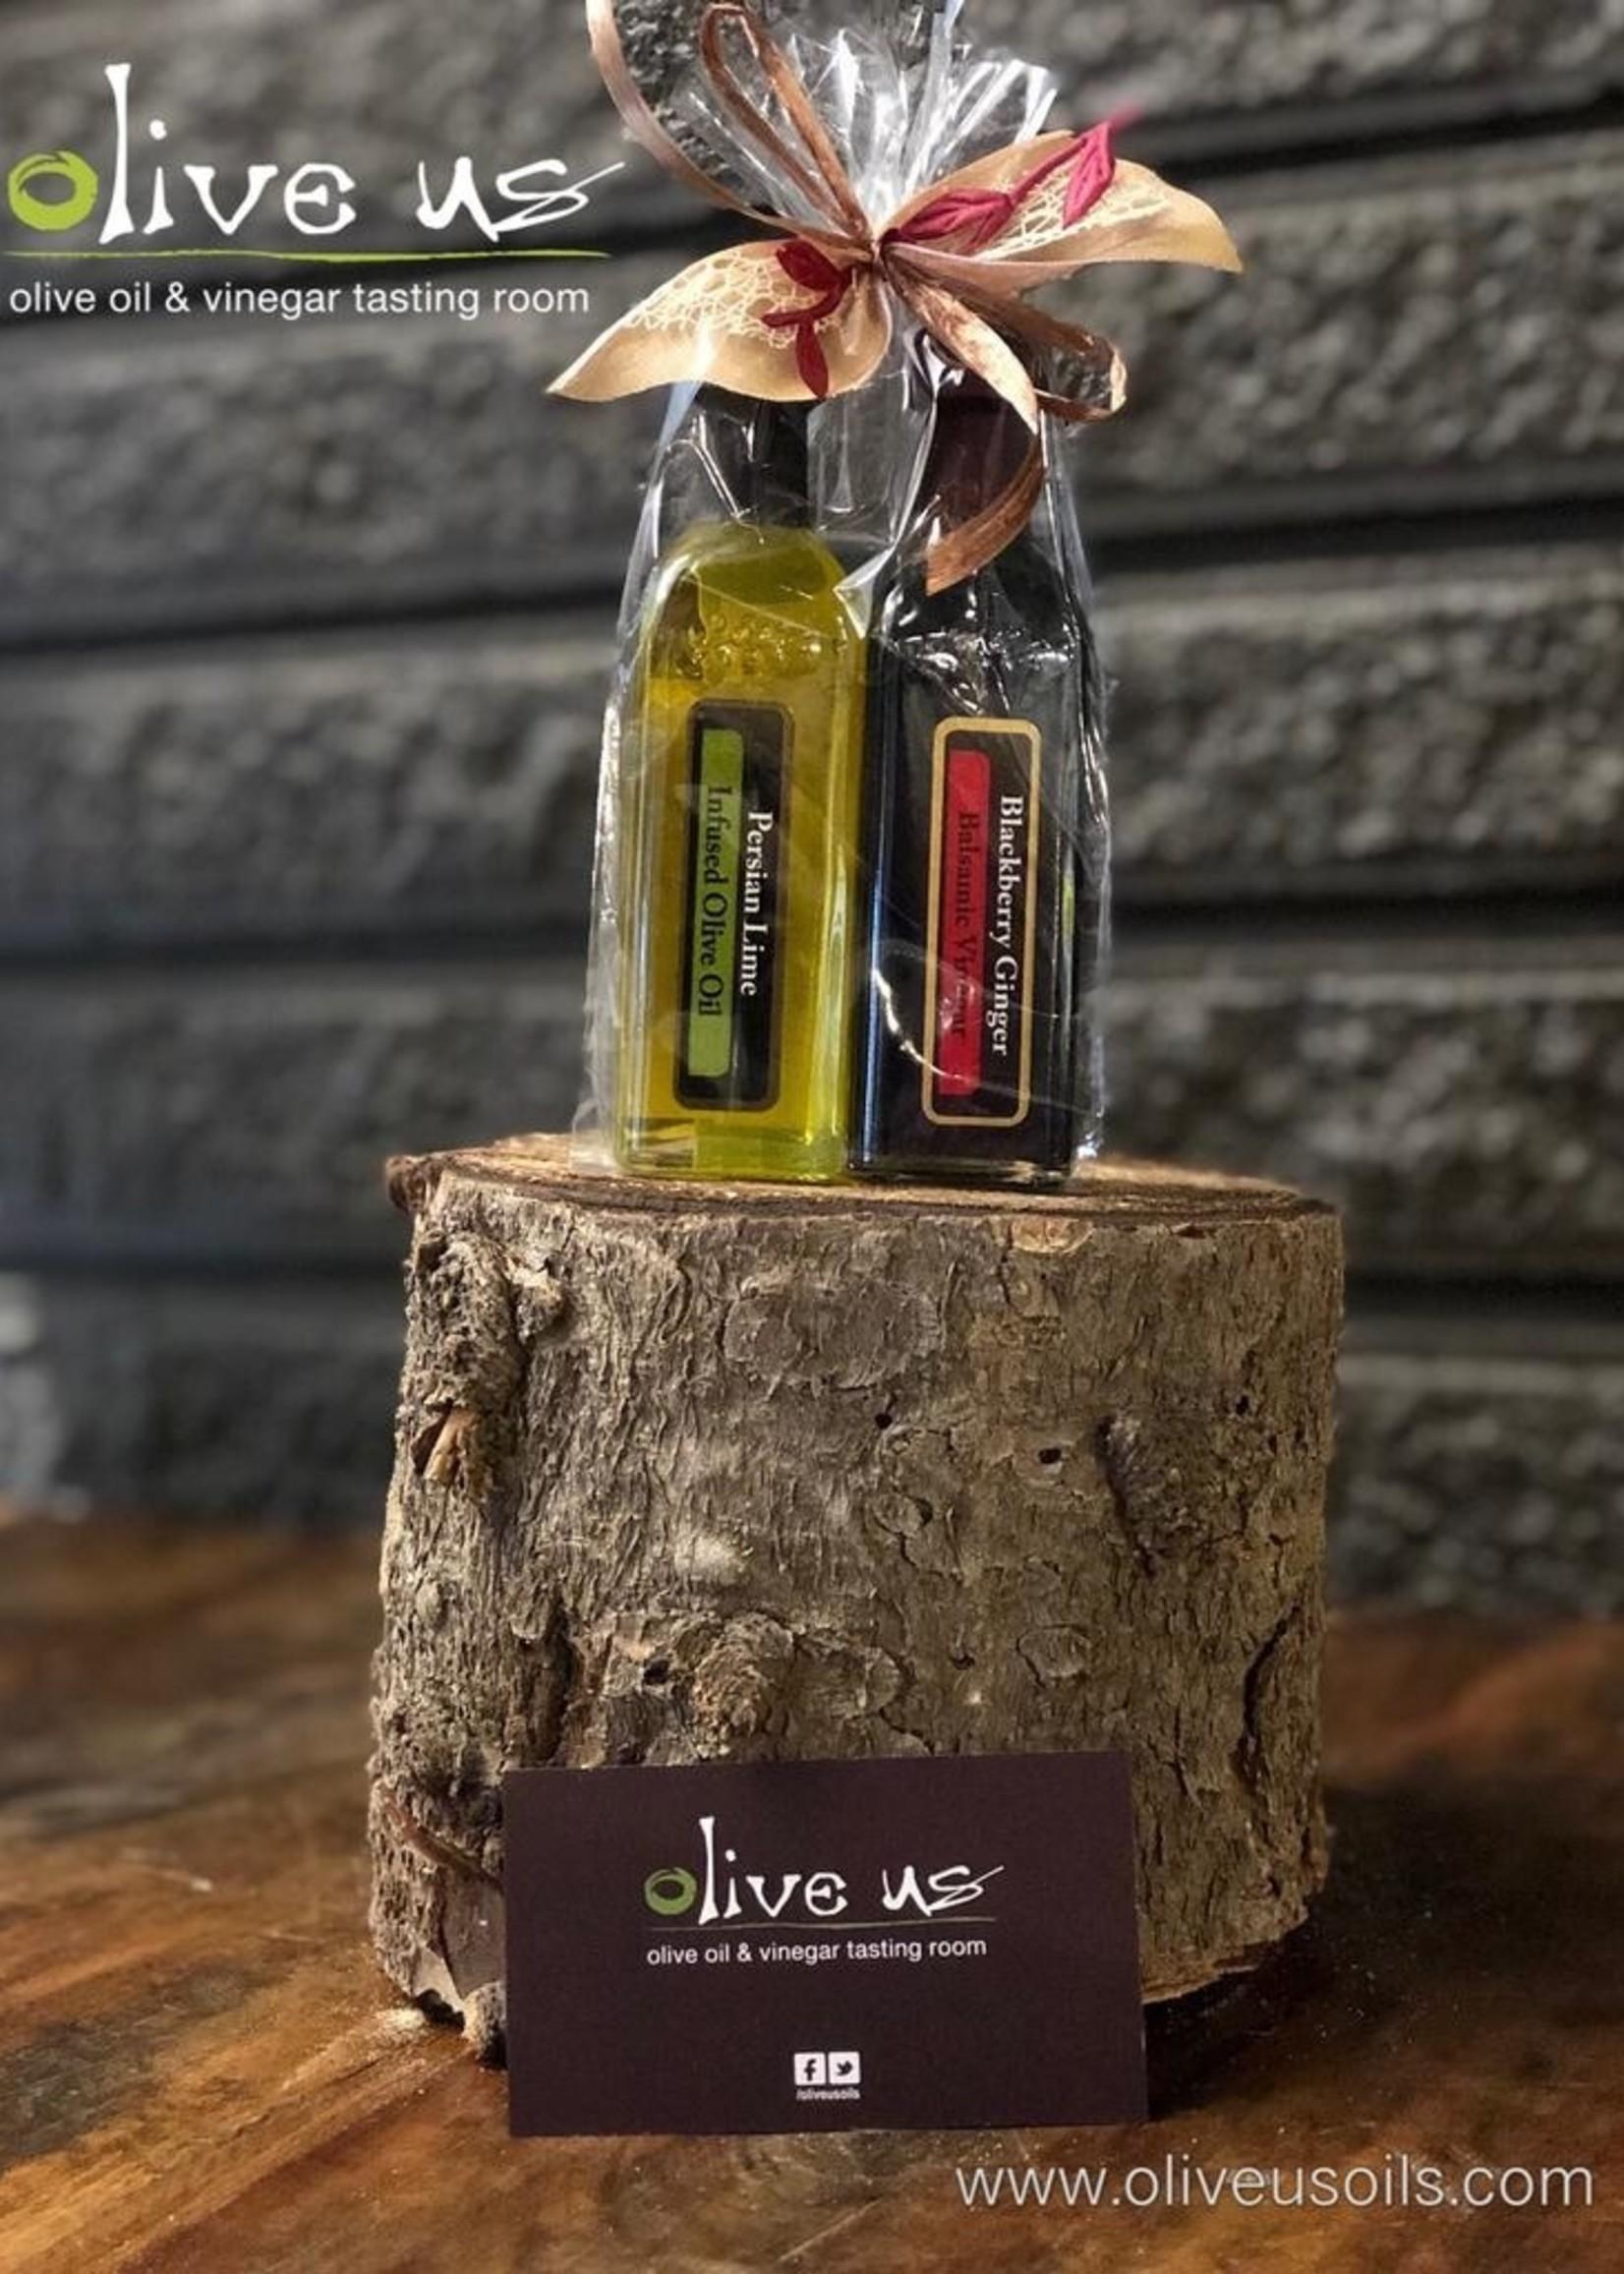 Olive Us 2Pack 60ml - Persian Lime & Blackberry ginger